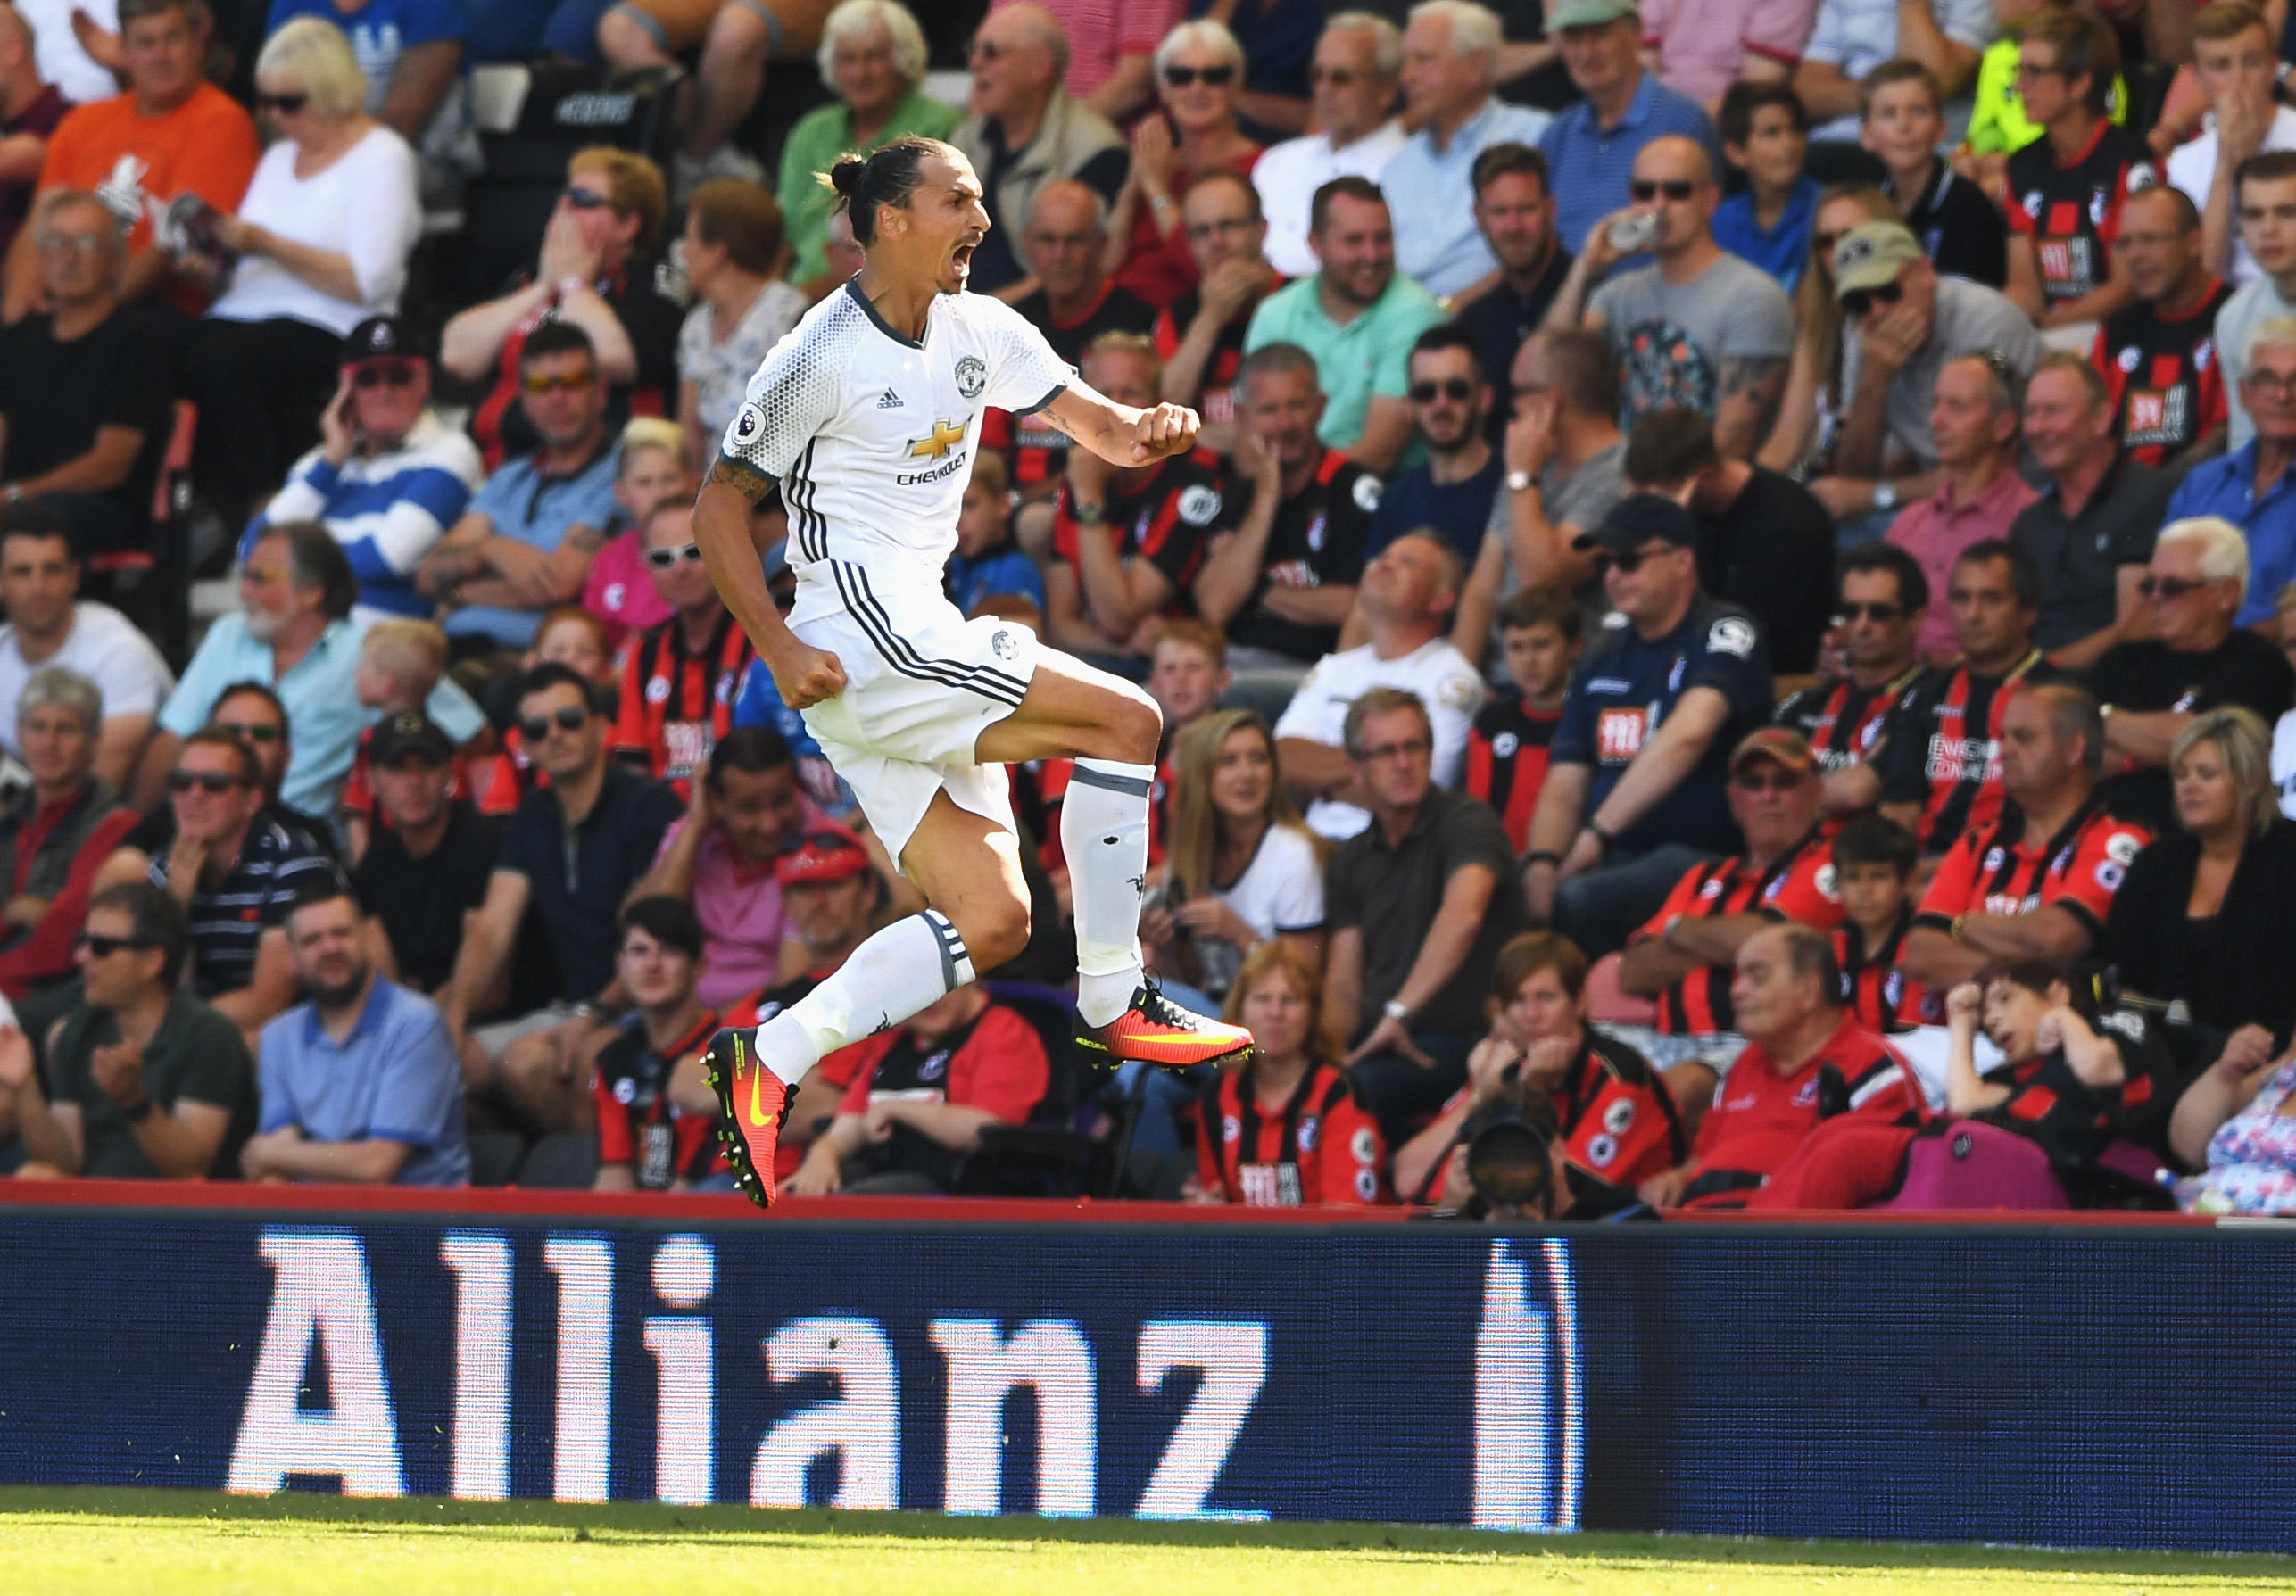 بورنموث 1-3 منچستریونایتد؛ اولین پیروزی لیگ برتریِ مورینیو با شیاطین سرخ و درخشش زلاتان